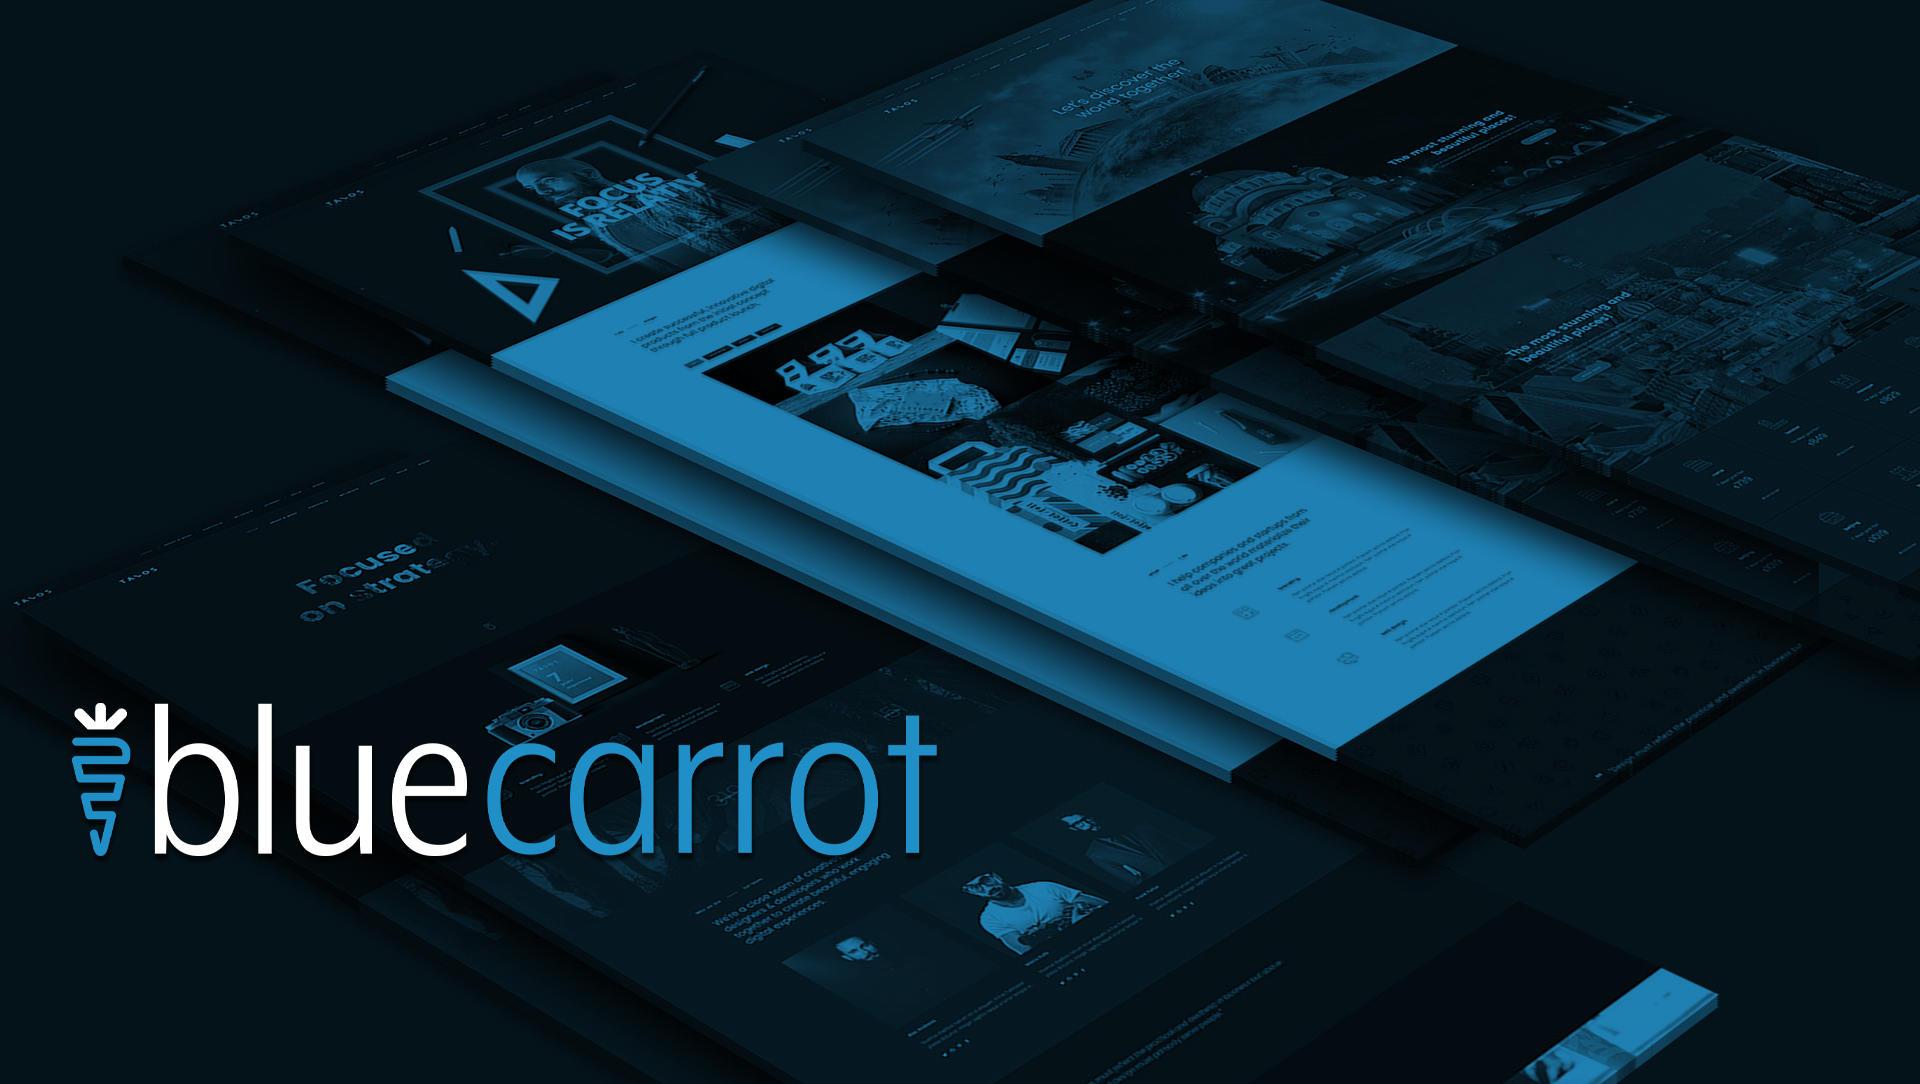 Blue Carrot Creative image 4